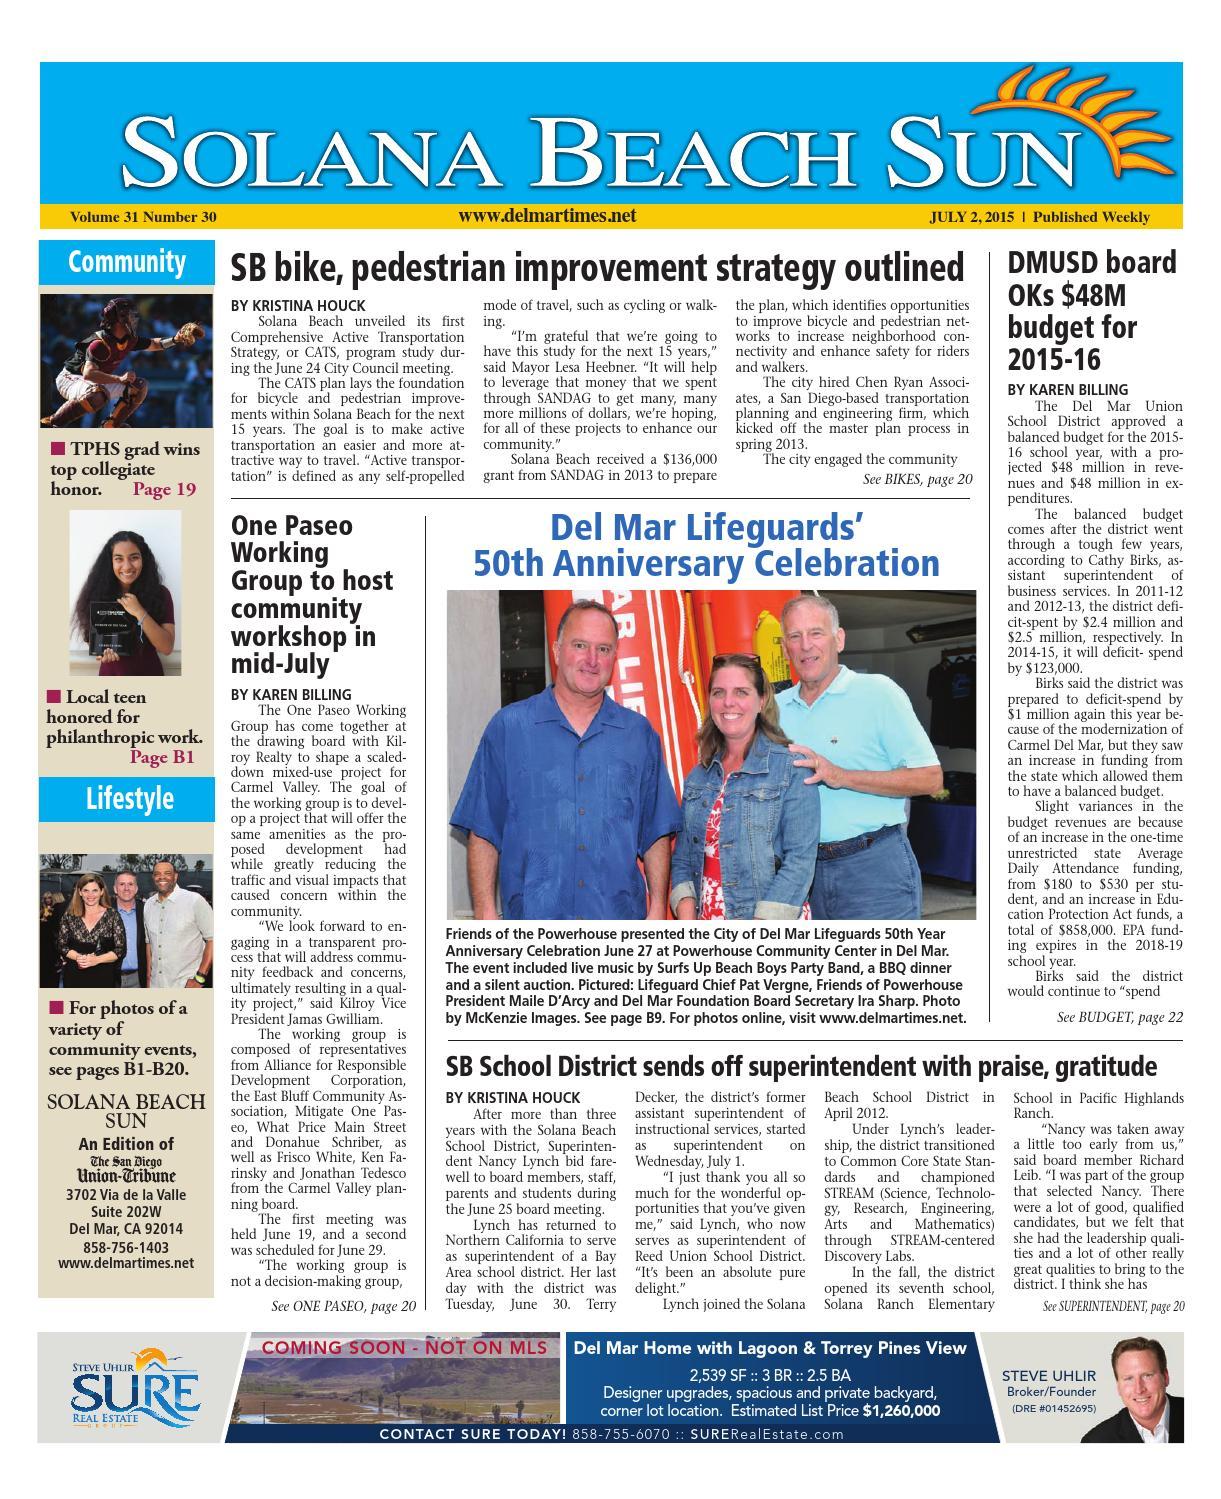 b24fc5ae17be72 Solana beach sun 7 2 15 by MainStreet Media - issuu